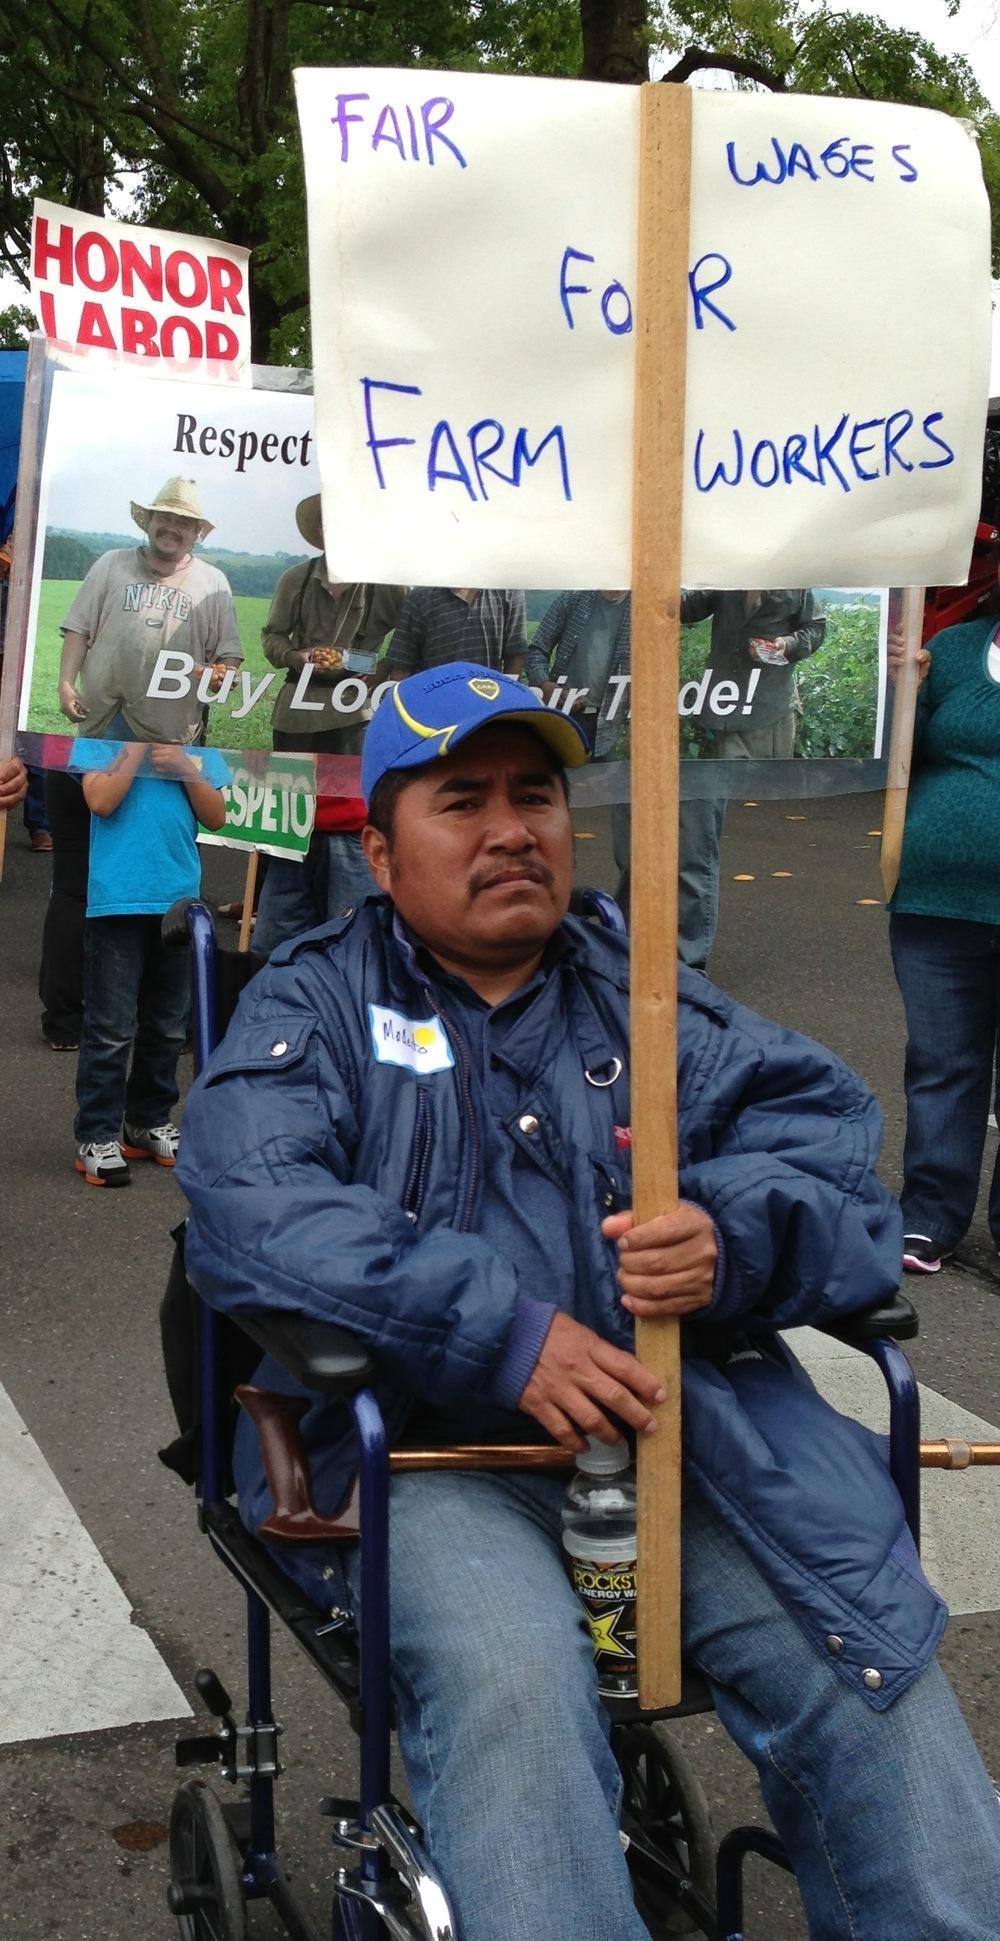 Modesto Hernandez, Farmworker Organizer